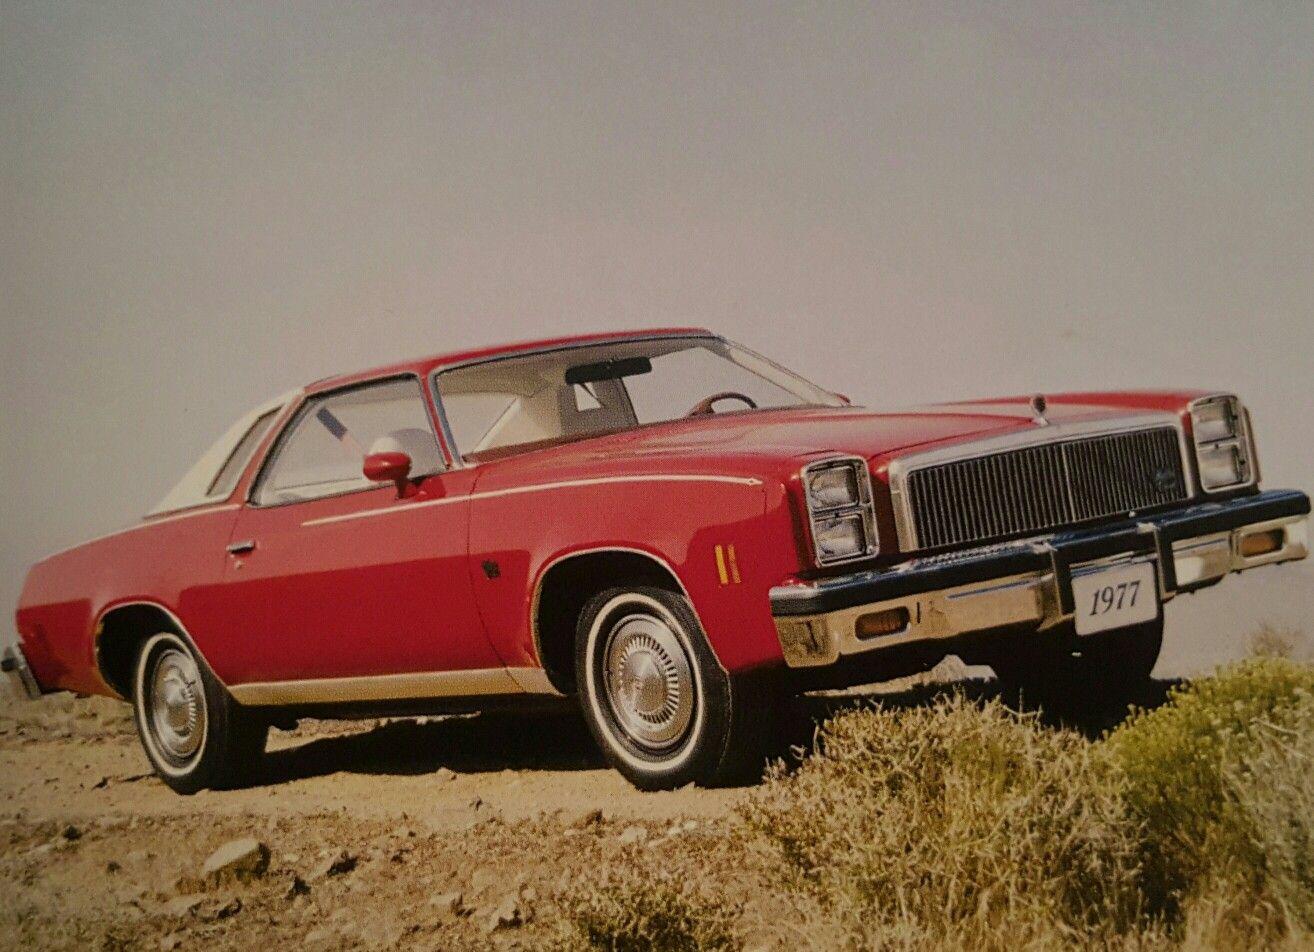 1977 Chevrolet Malibu Classic Coupe Chevrolet Malibu Chevrolet